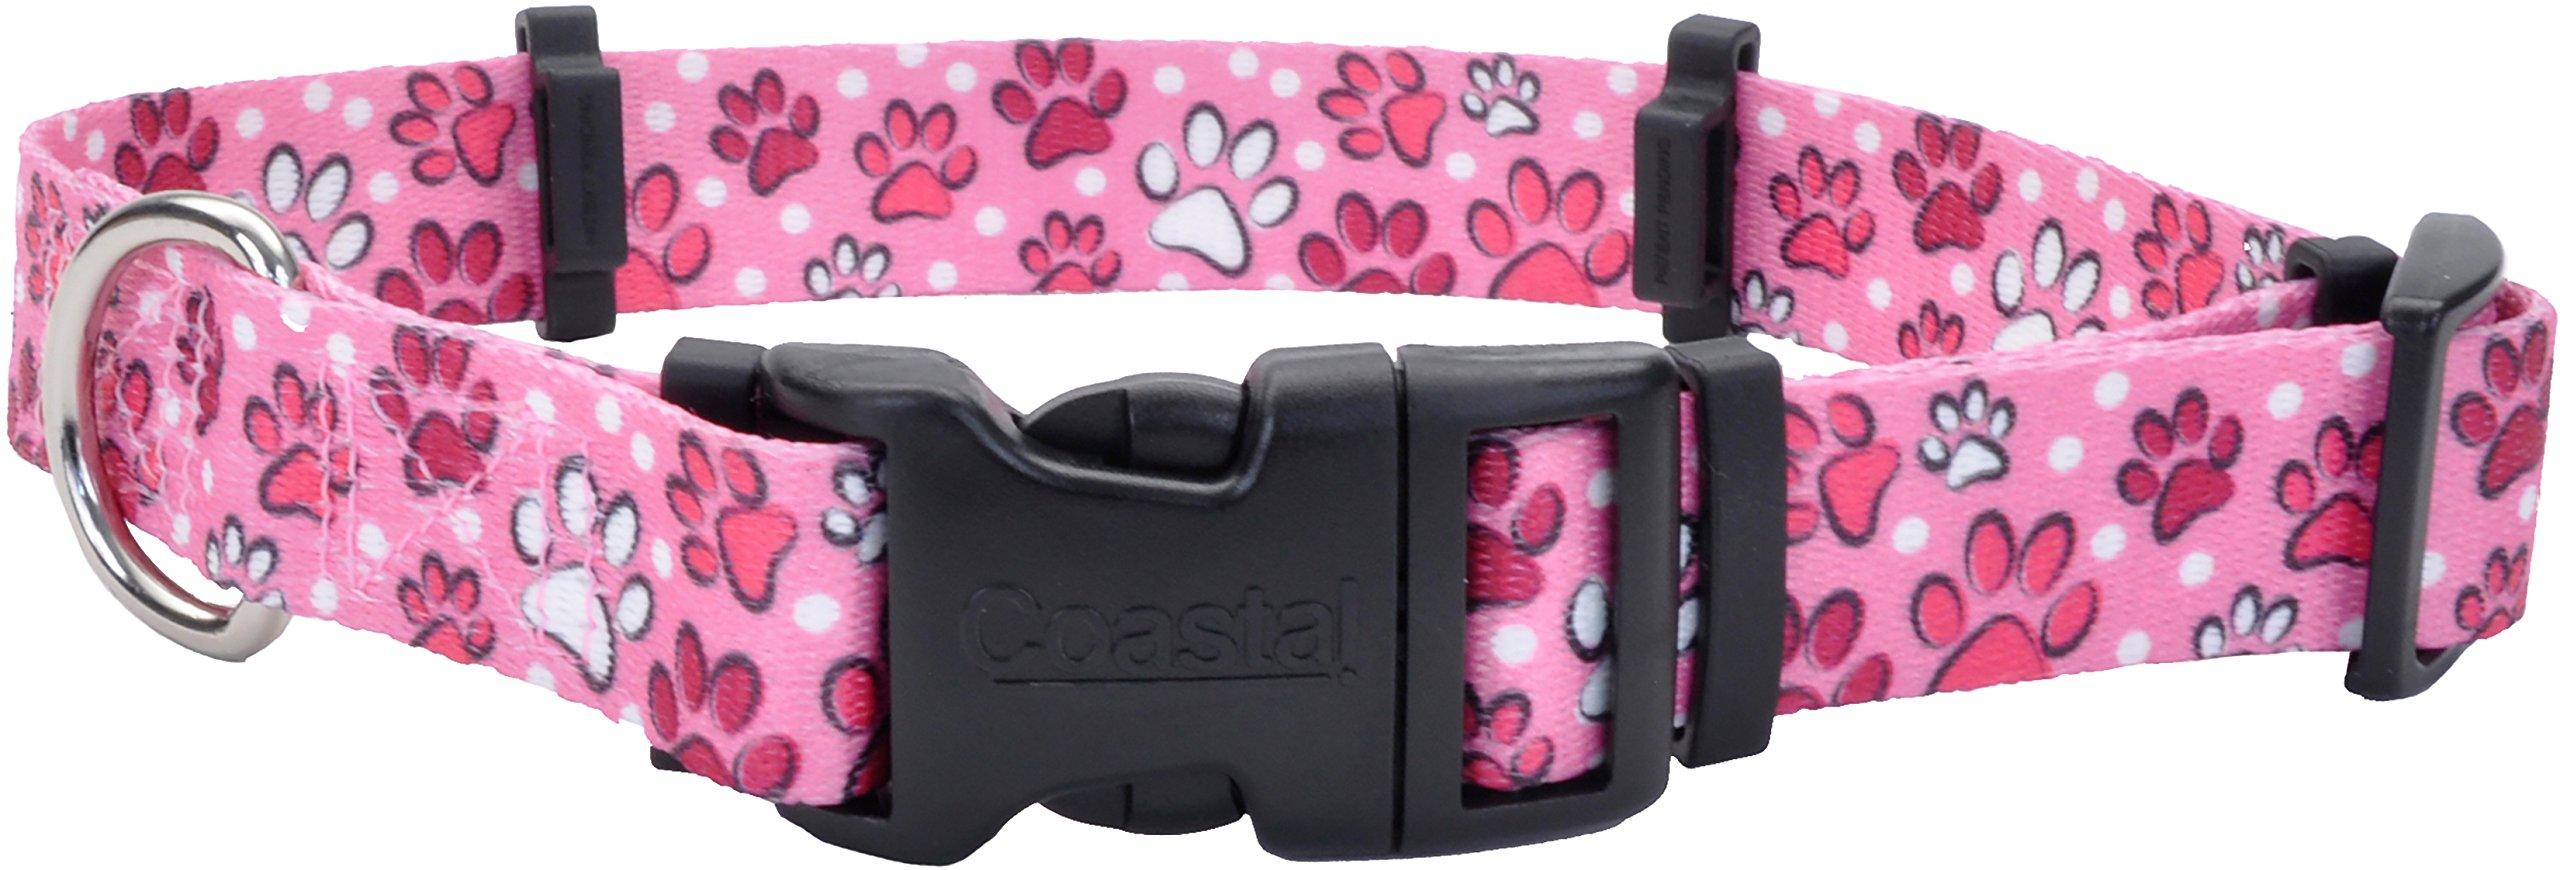 Coastal Pet Products 06144 MPW14 Flea Collar Protector, 0.625'' x 14'' Small, Multi Paws by Coastal Pet (Image #1)